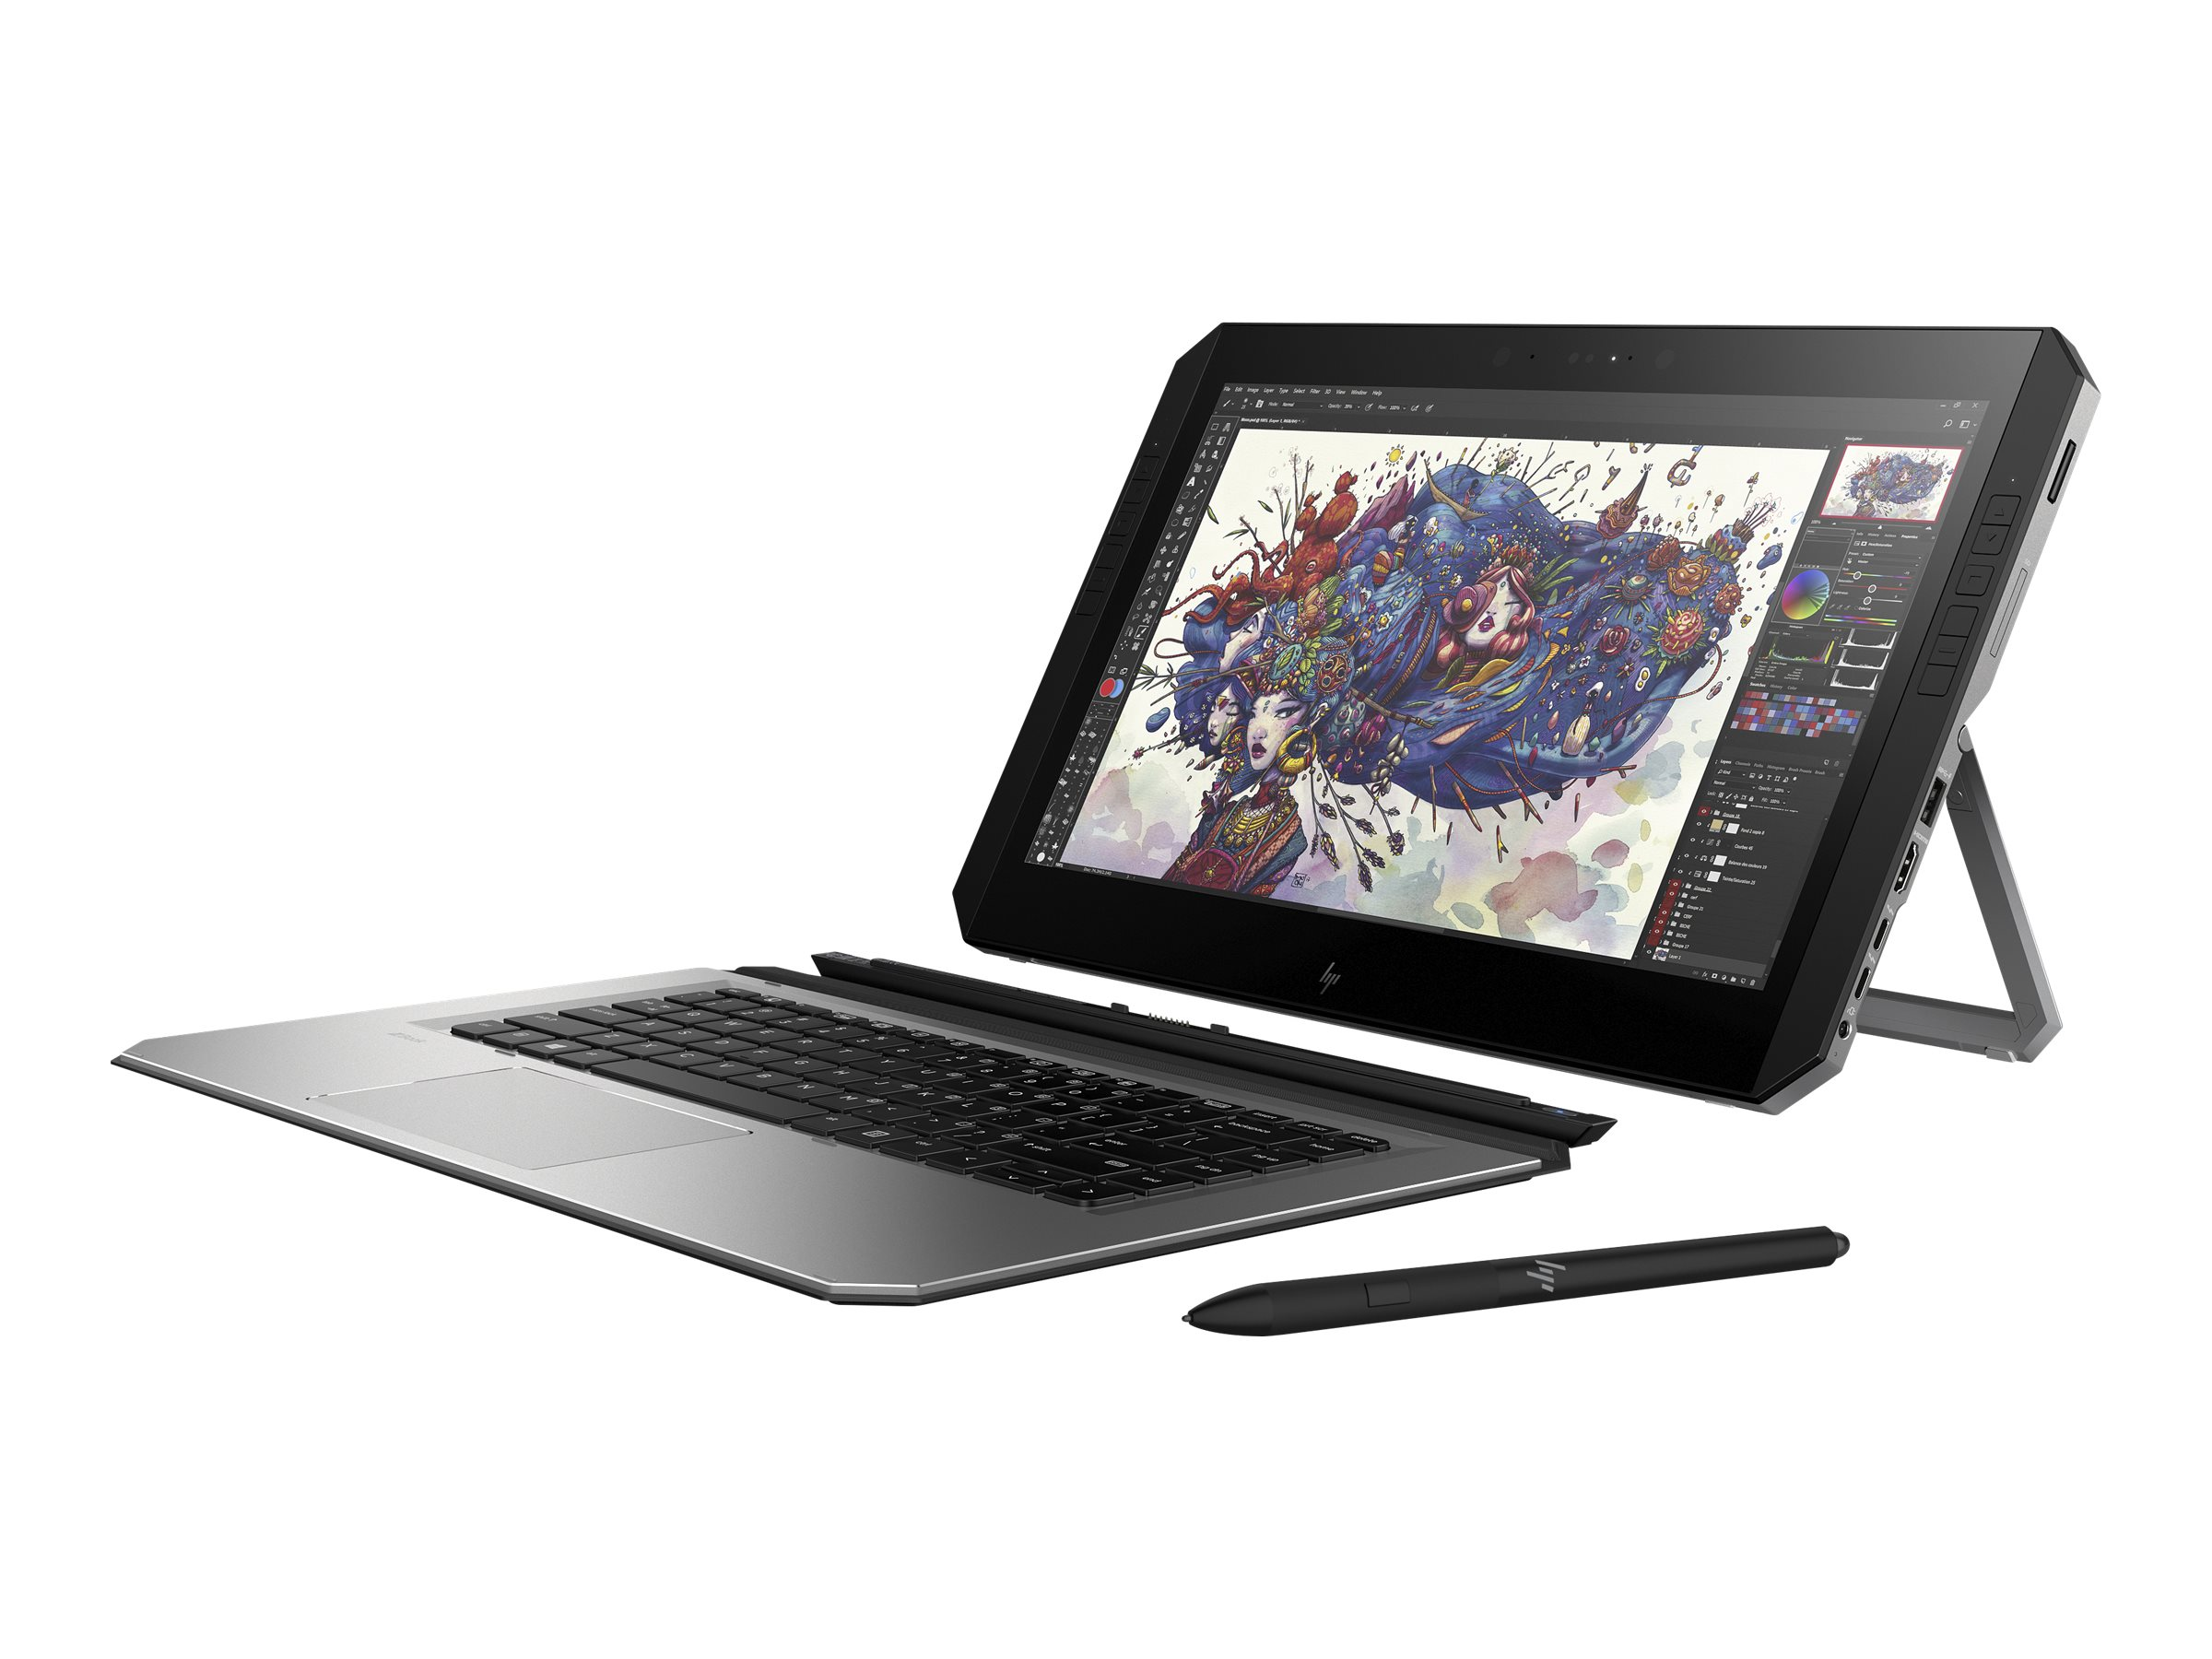 Hp zbook x2 g4 detachable workstation tablet mit bluetooth tastatur core i7 8650u 1 9 ghz win 10 pro 64 bit 32 gb ram 8495060 2zc13ea abd